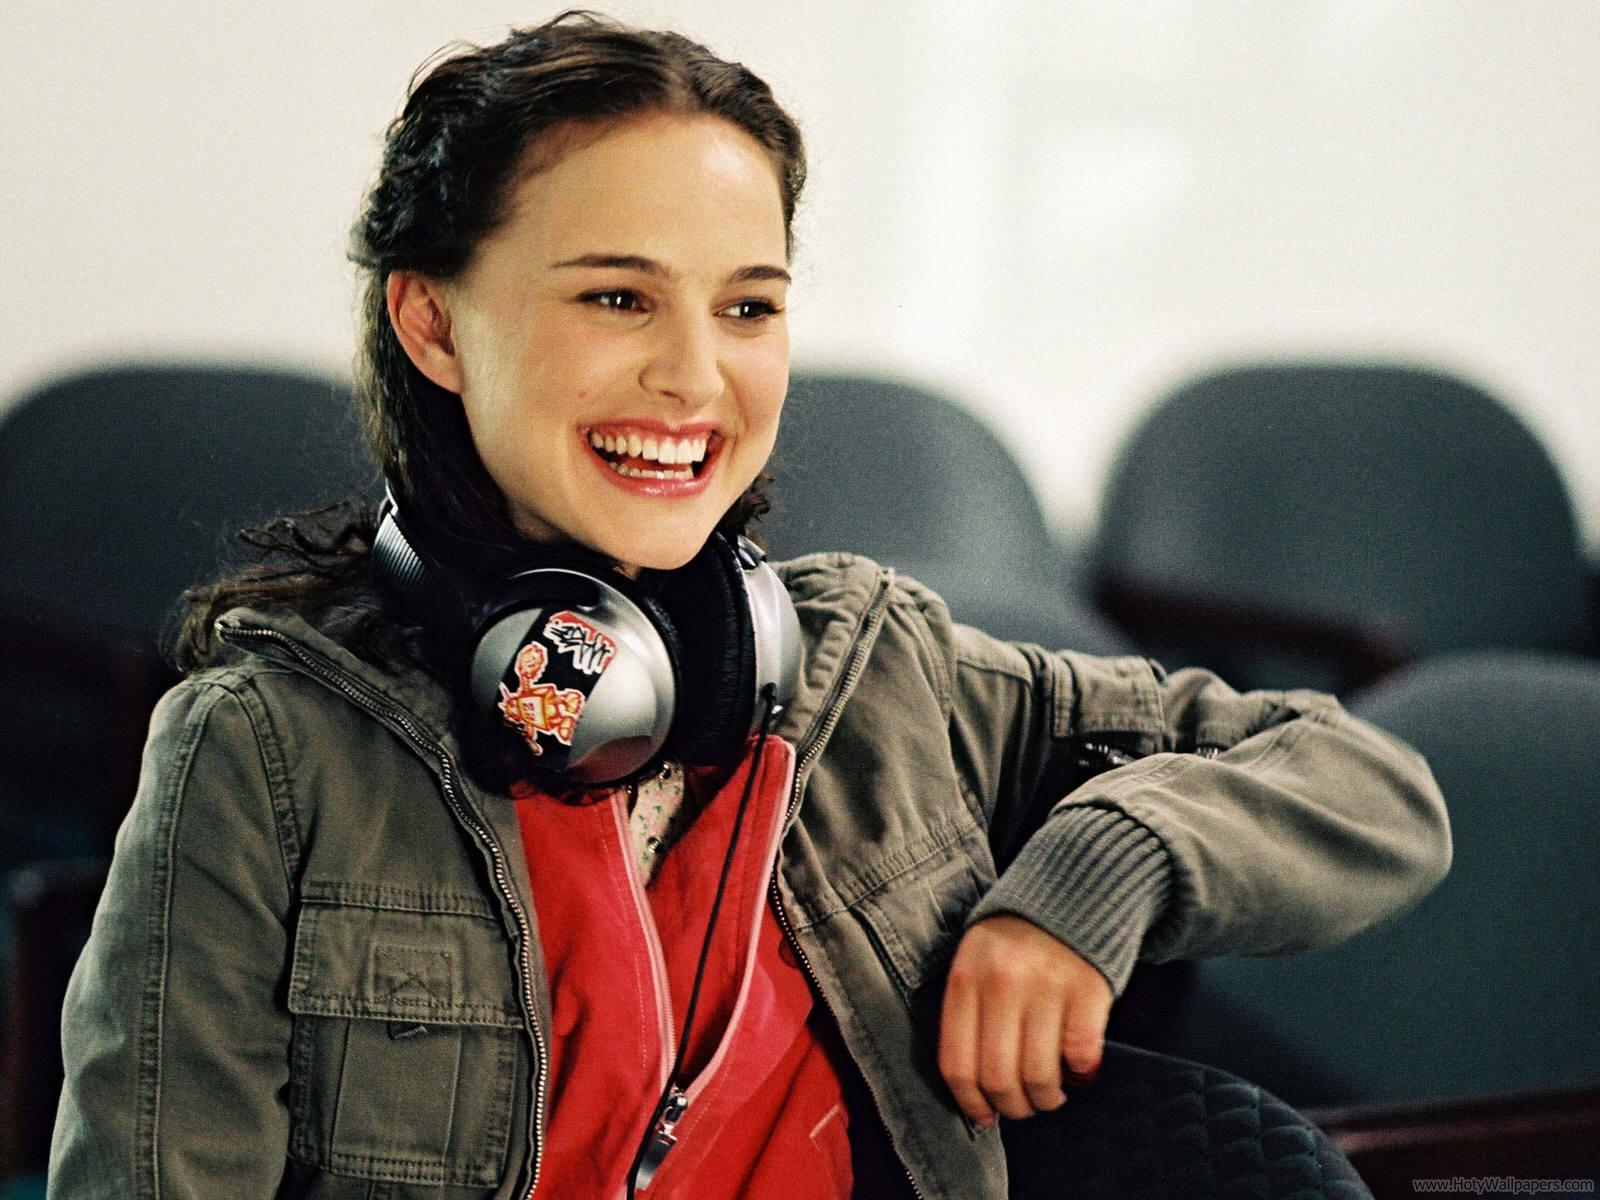 http://3.bp.blogspot.com/-_eIfkN0g7PA/TrQVmura3nI/AAAAAAAAOWE/RYmhpojmgOA/s1600/natalie_portman_american_actress_wallpaper-06-1600x1200.jpg